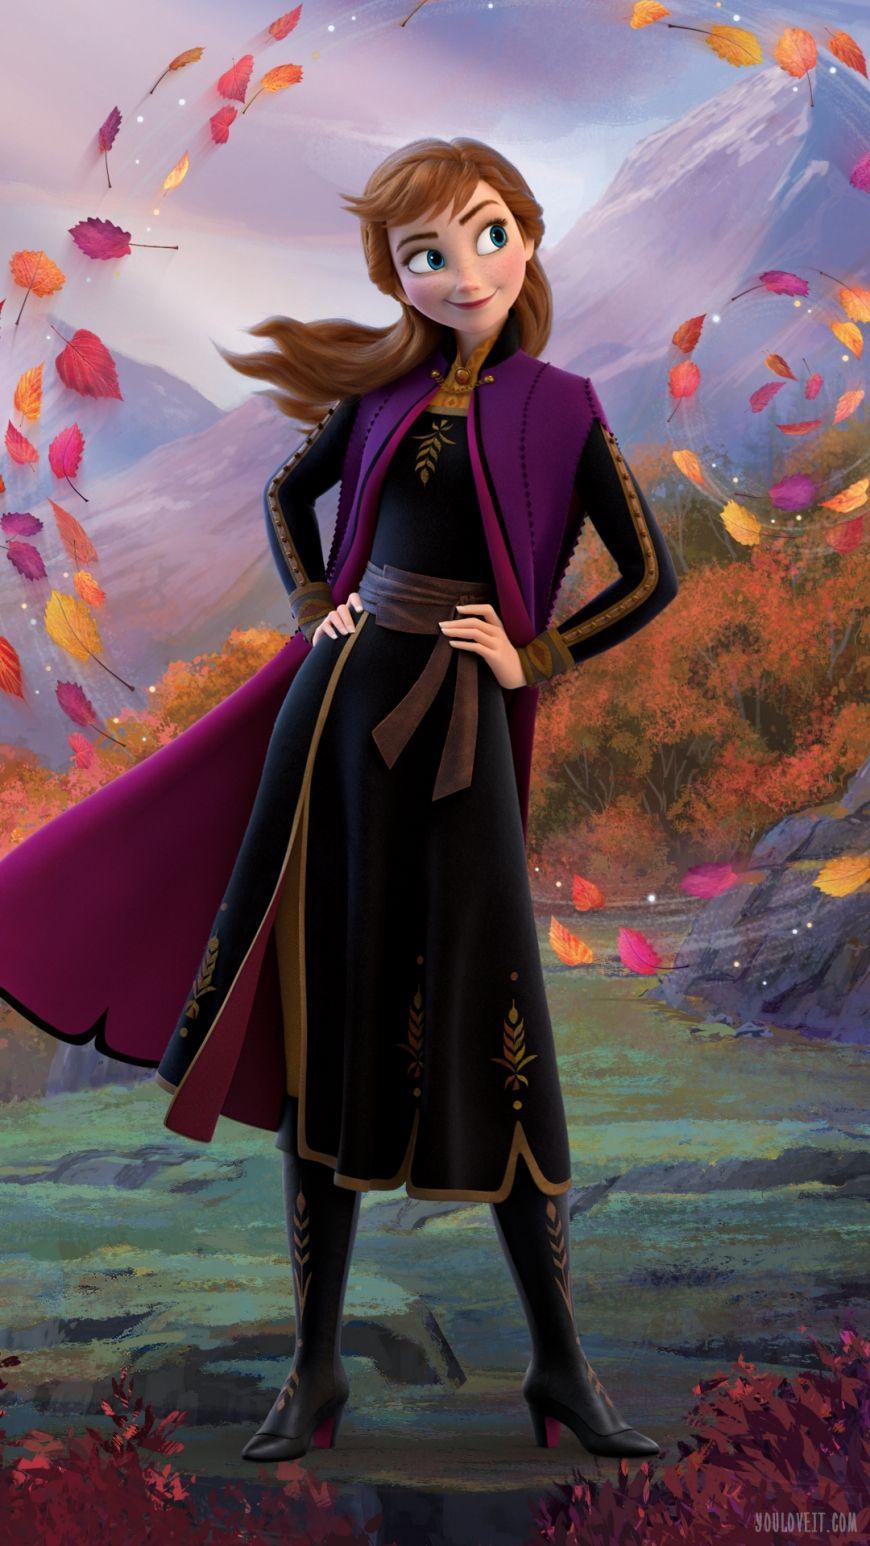 Photo of Cg artwork, Illustration, Fictional character, Anime, Long hair, Style